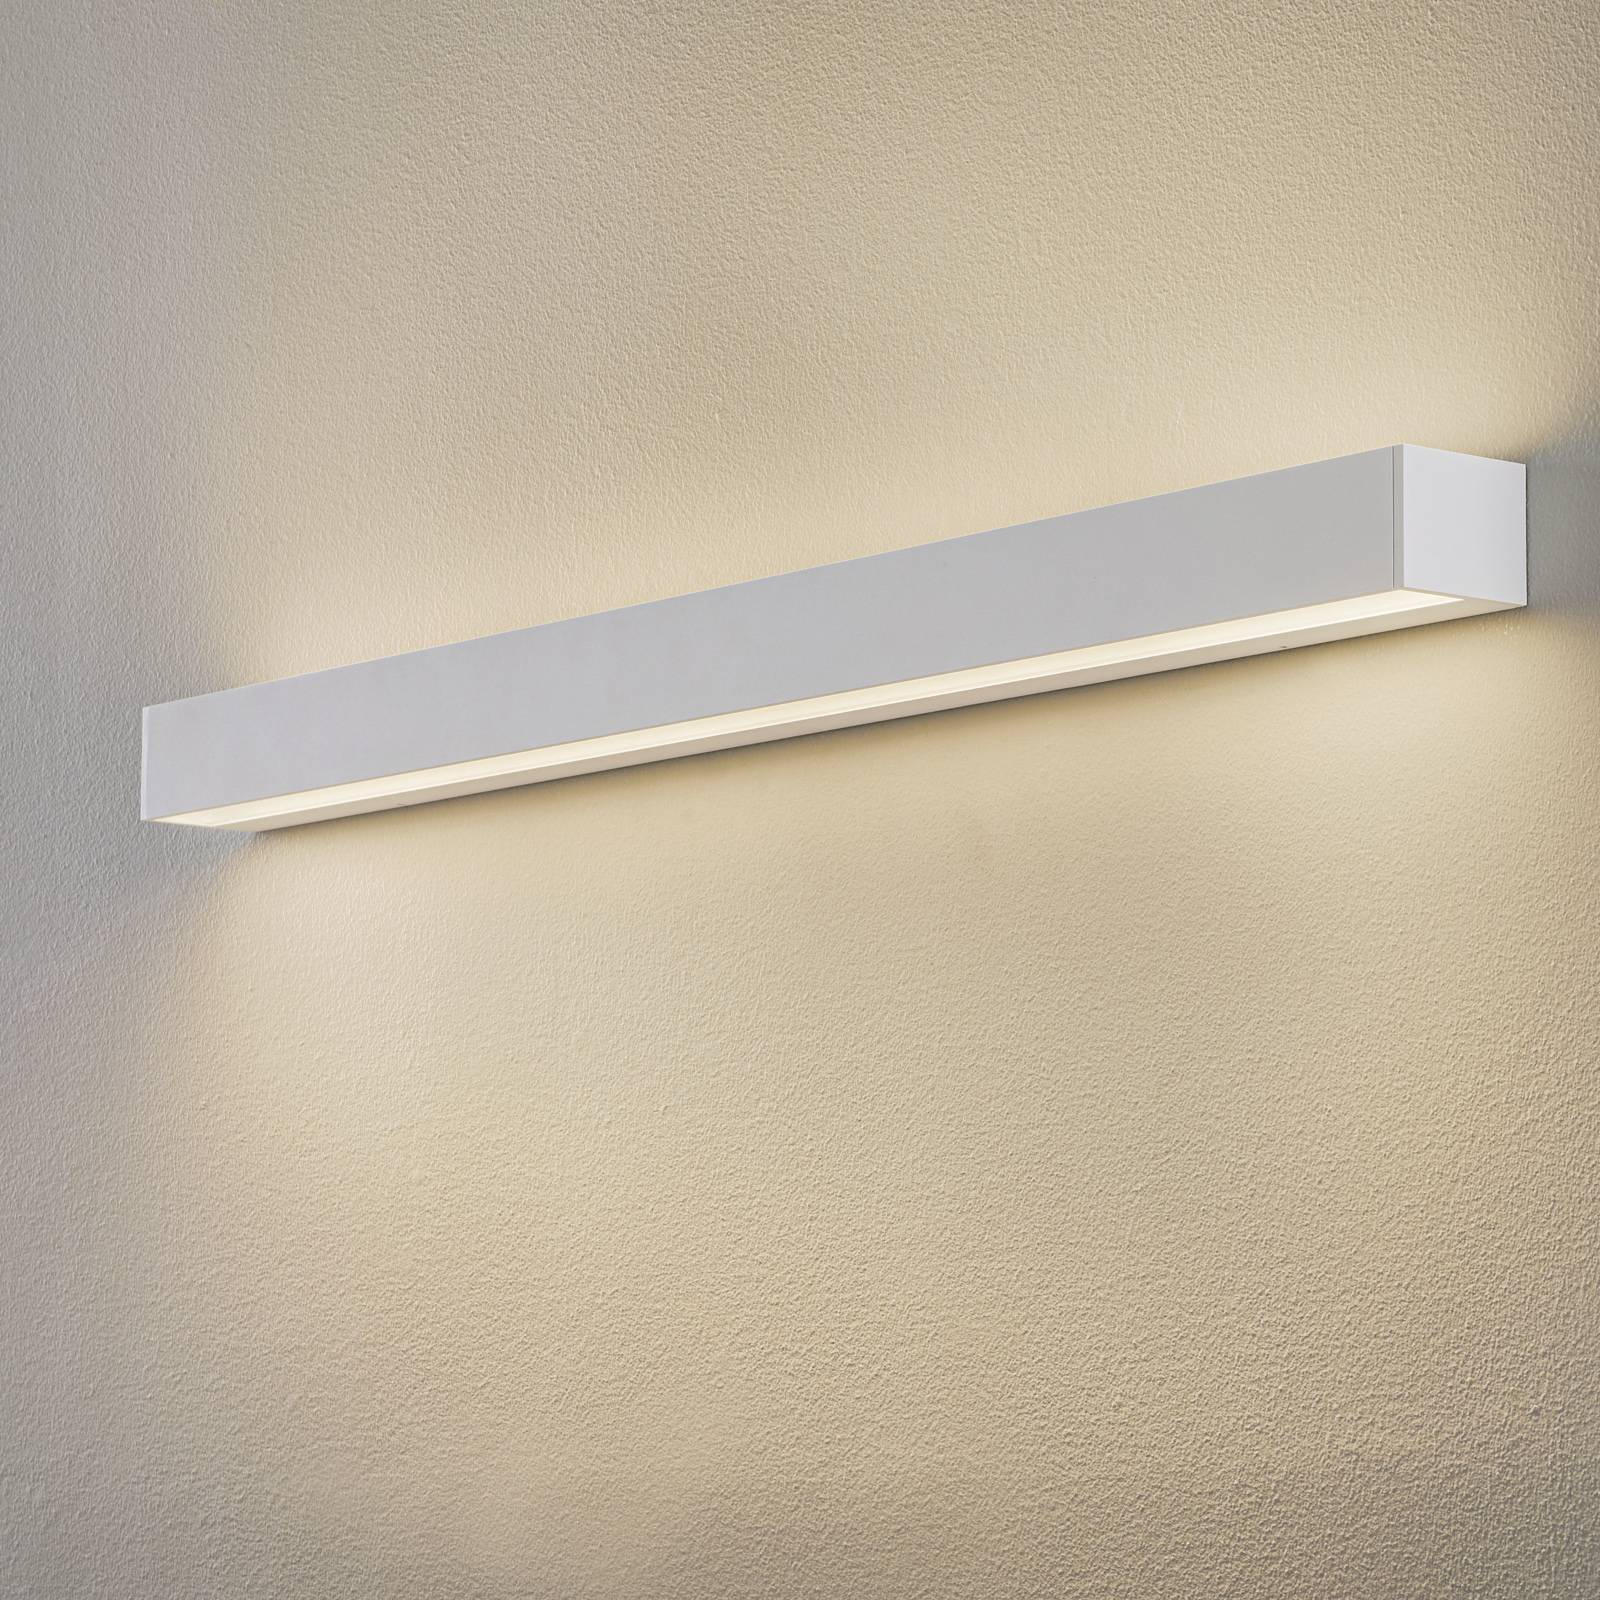 BEGA 50802 LED-seinälamppu valkoinen 7 520lm